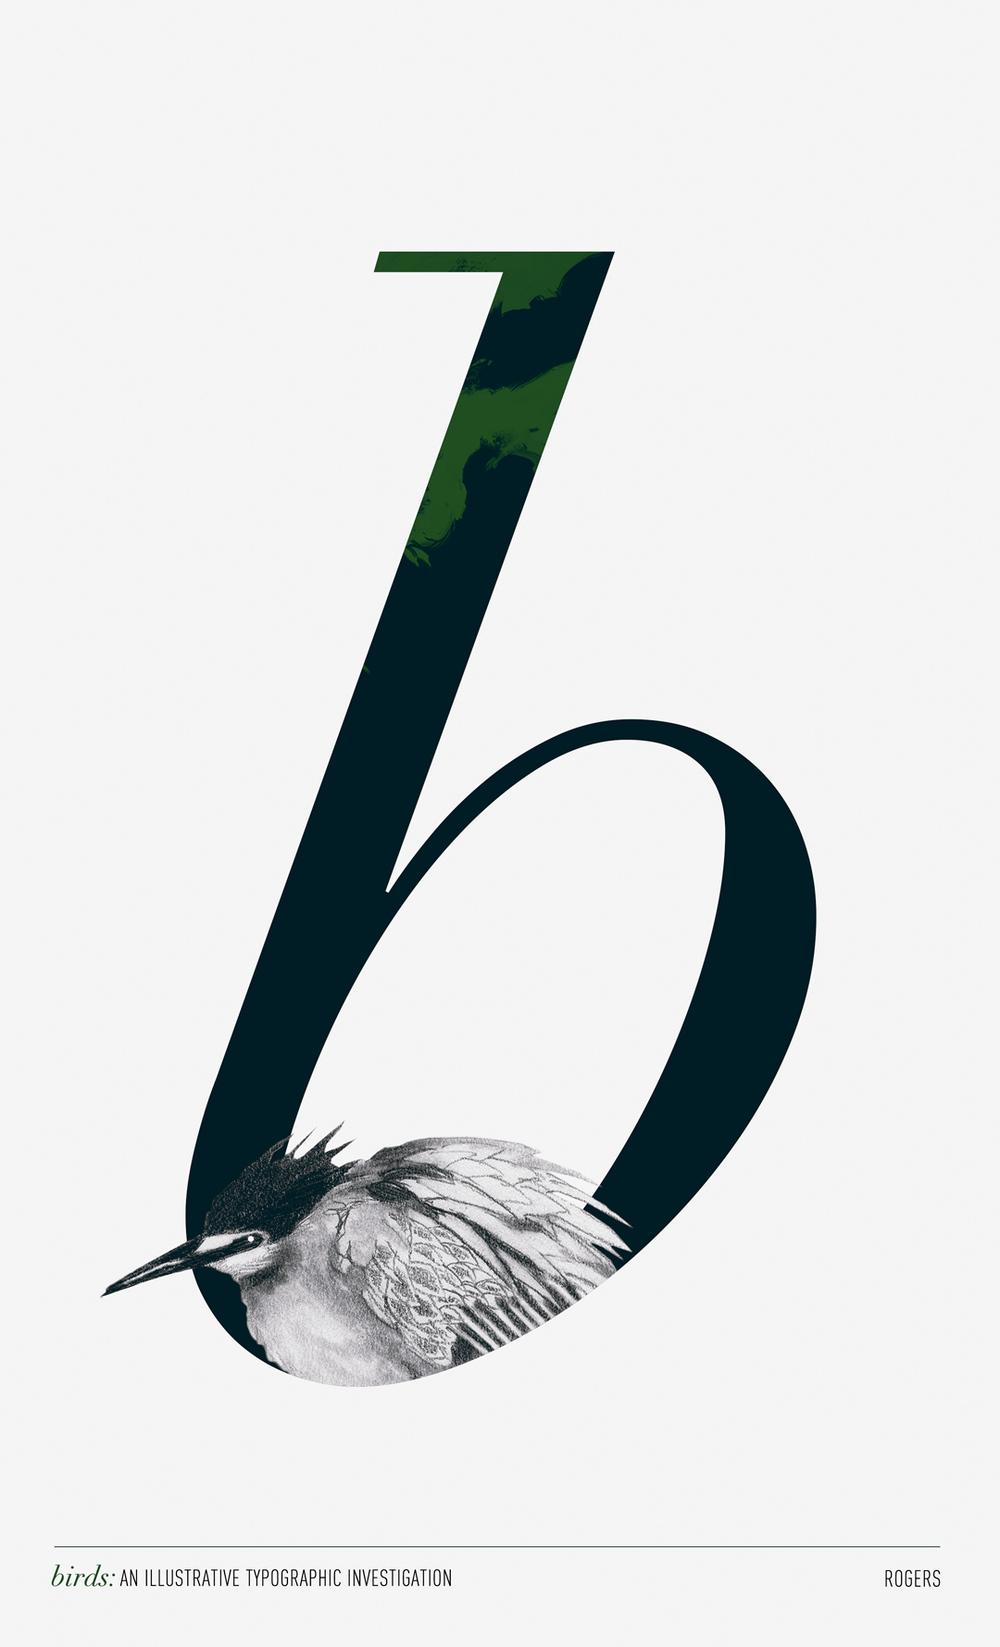 brogers-birds-b